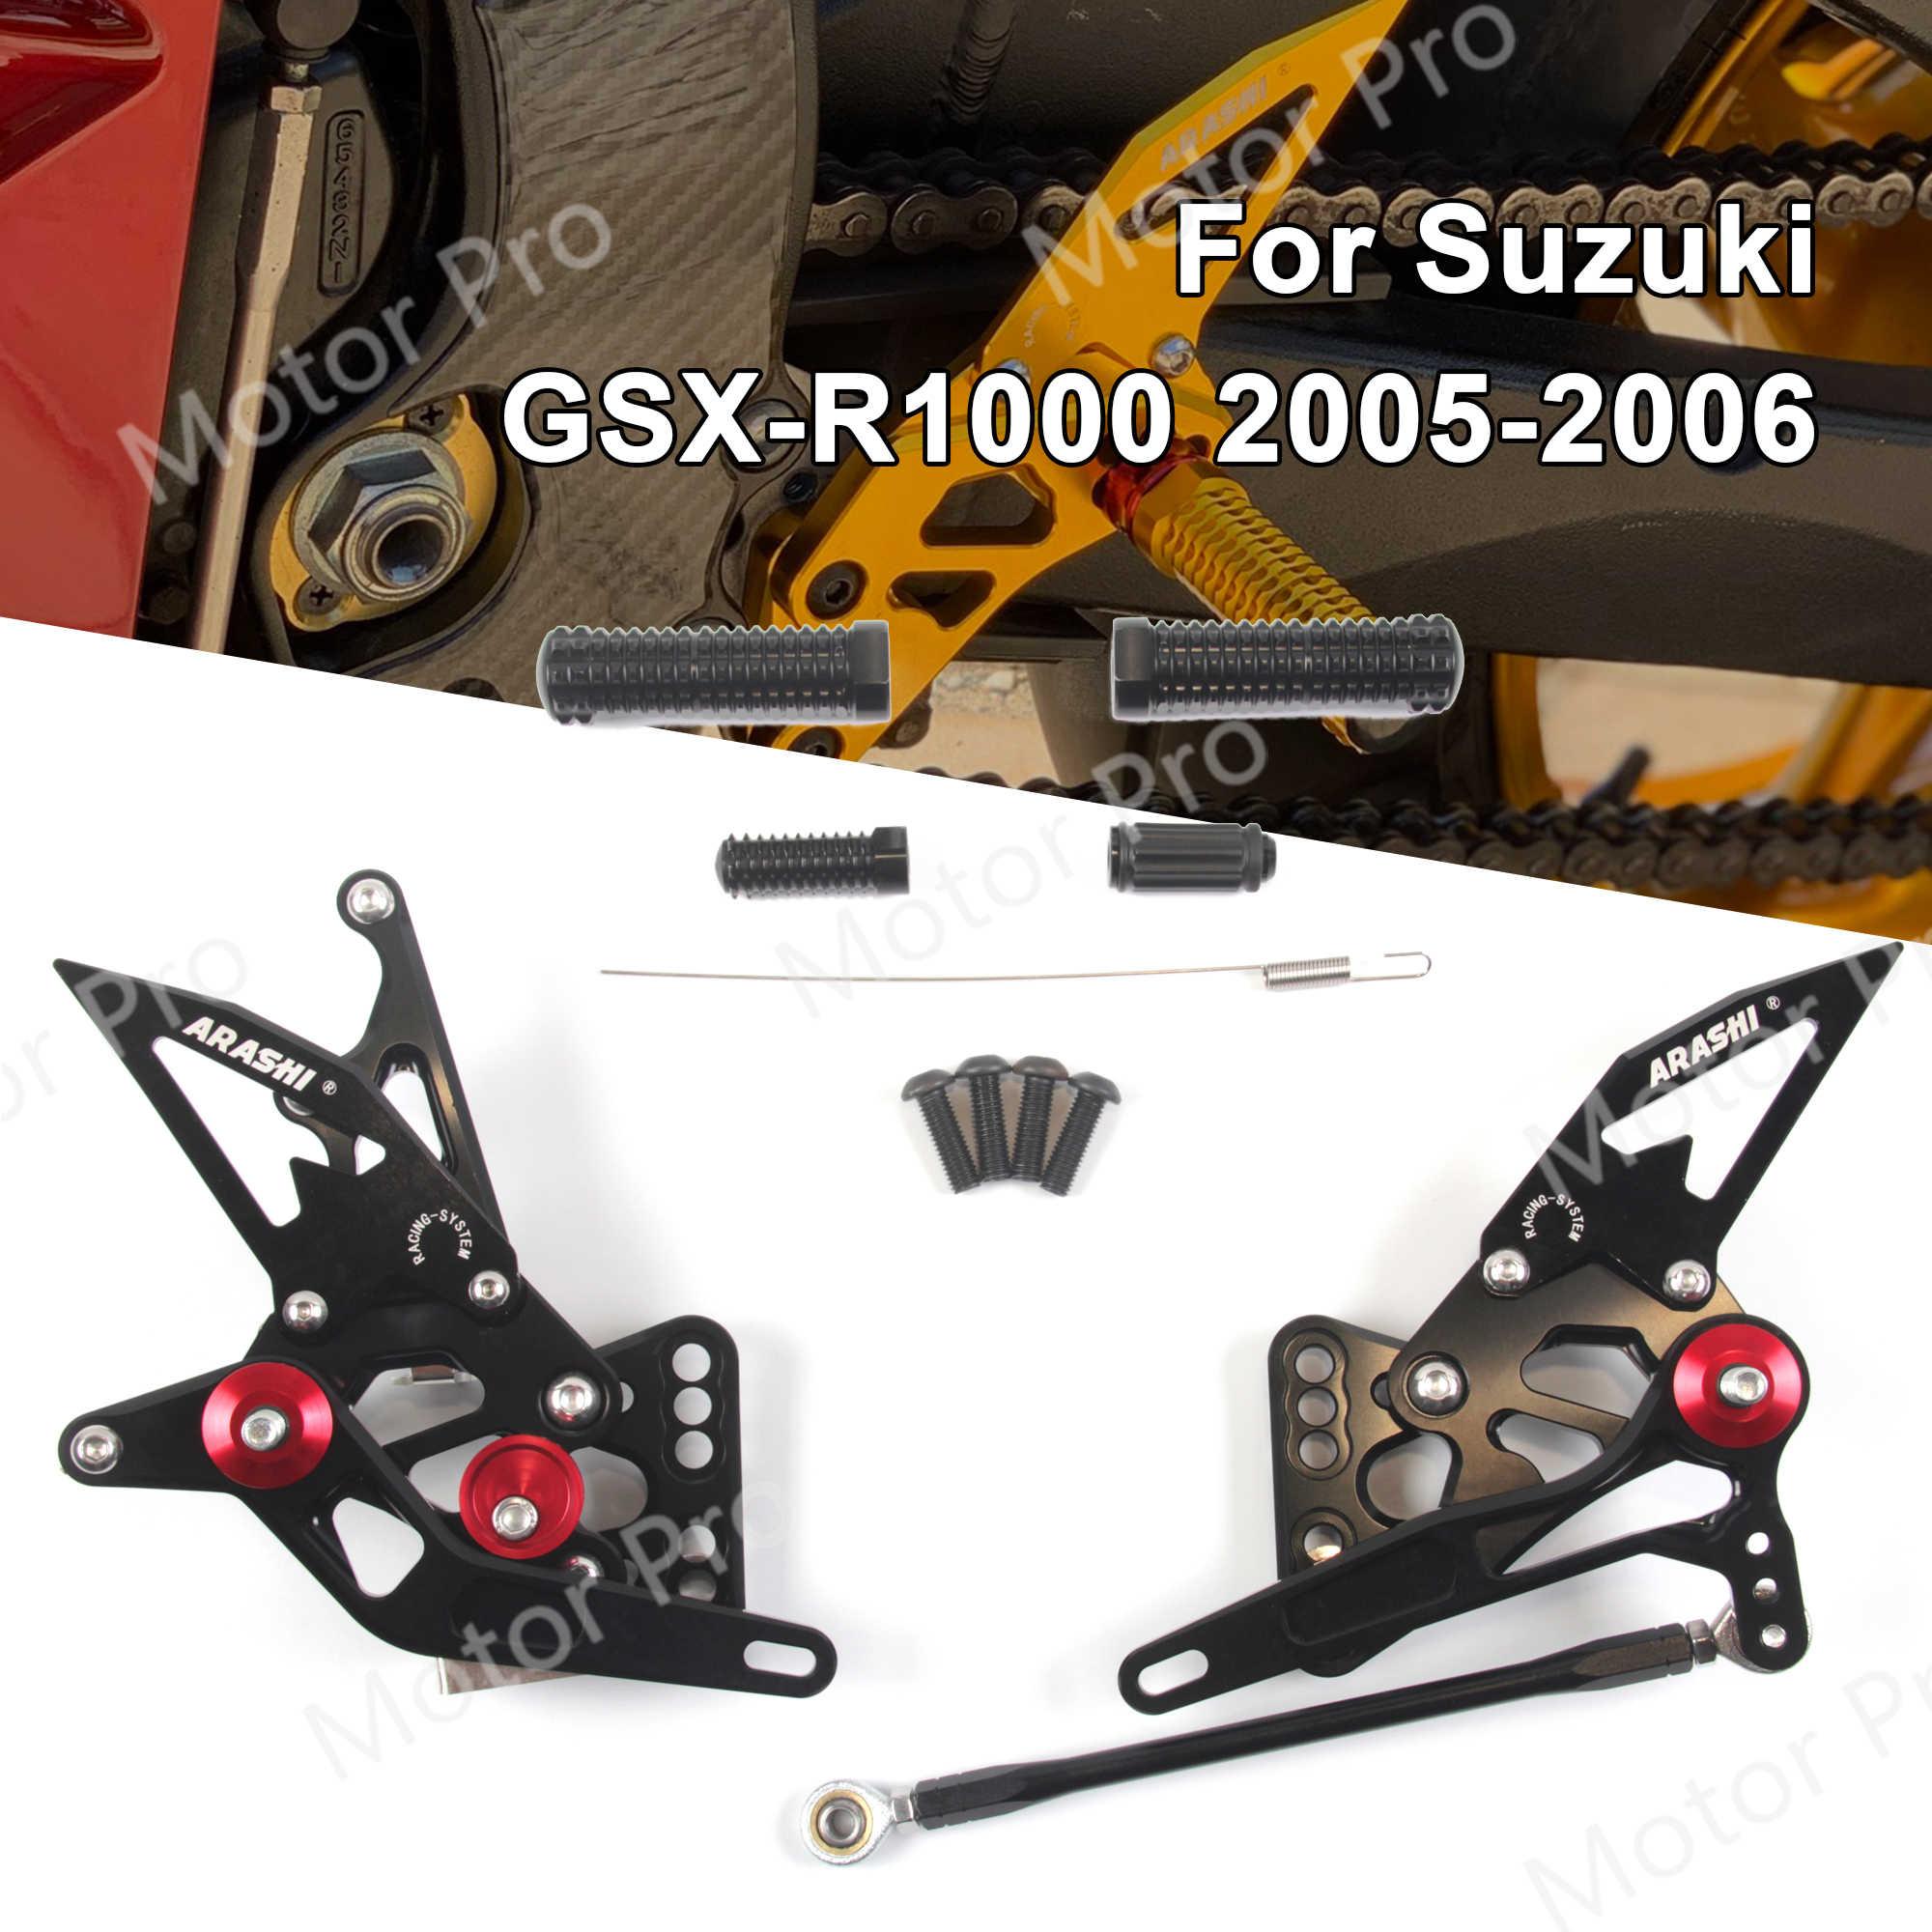 Adjustable Rearsets Front Racing Footrest l Kit For Suzuki GSXR1000 2005-2006